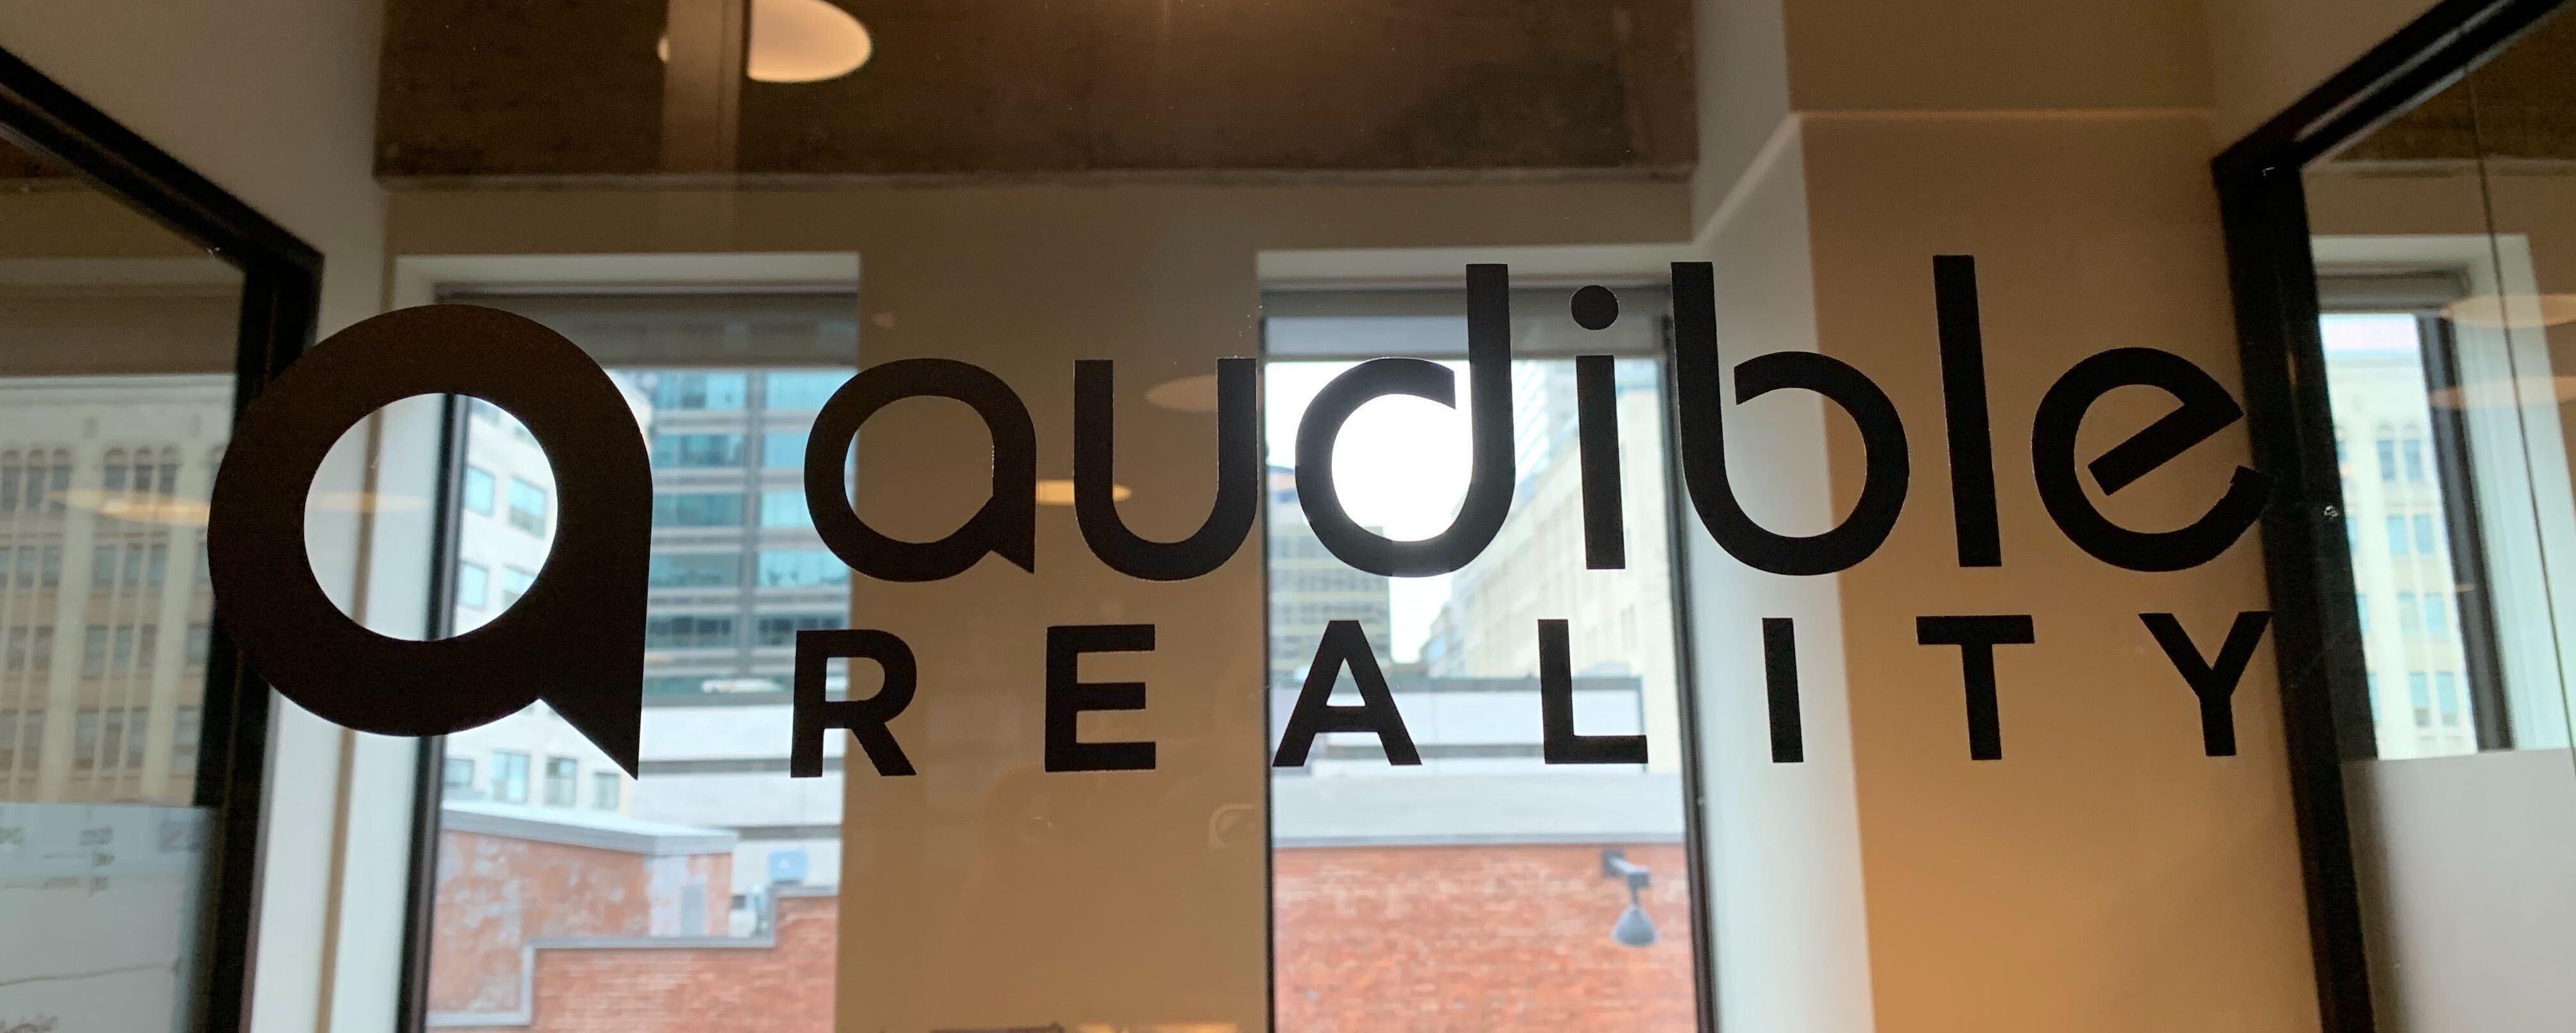 Meet Audible Reality